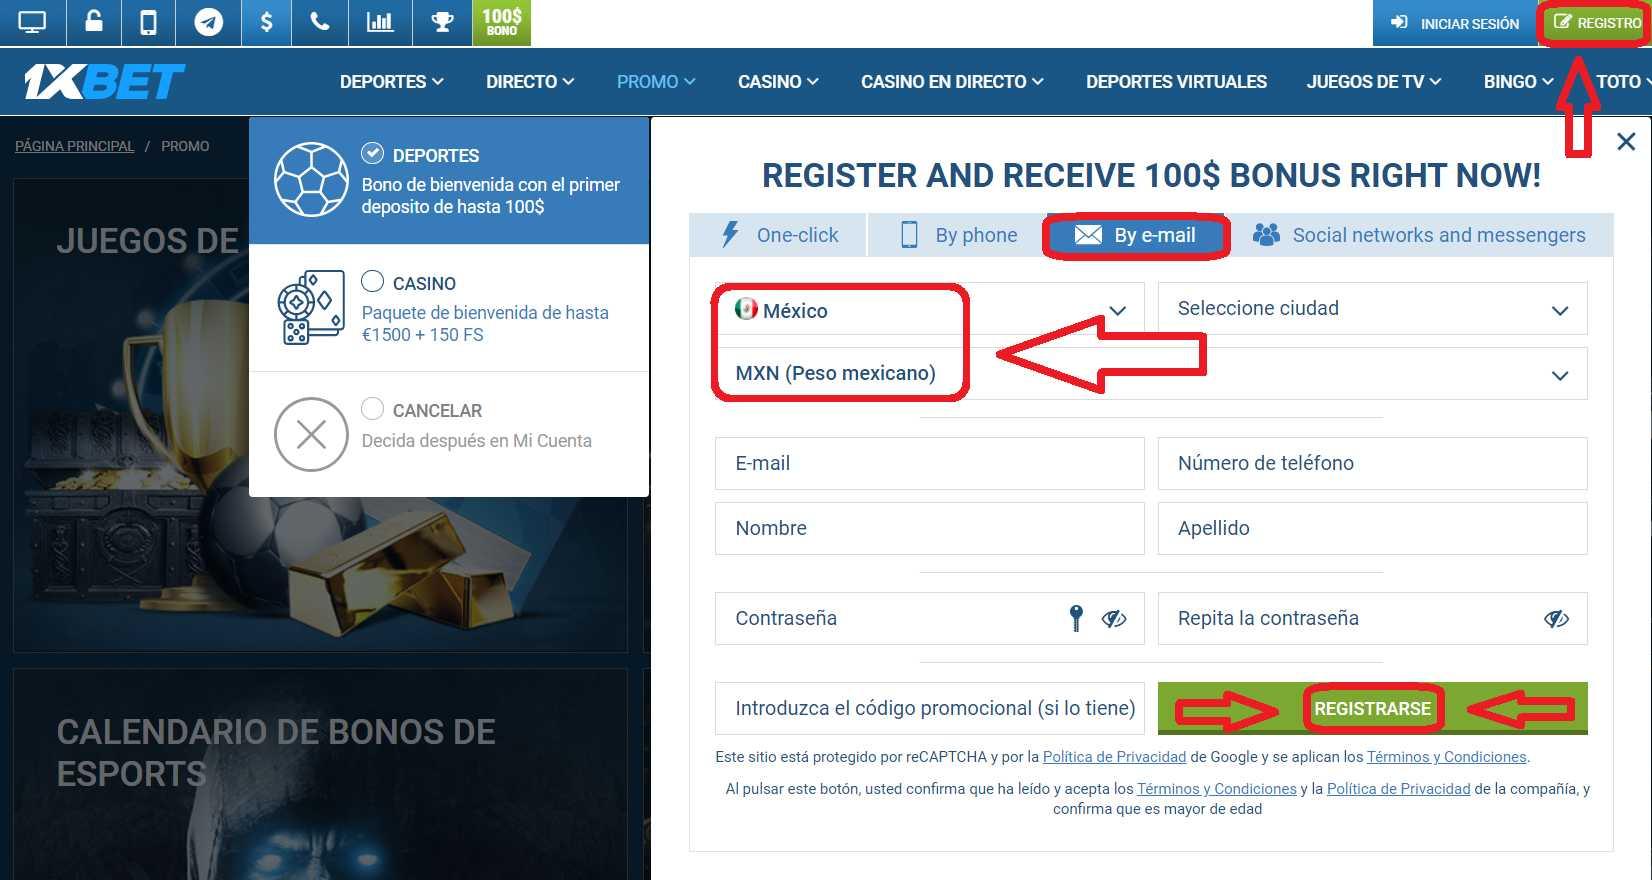 1xBet México register